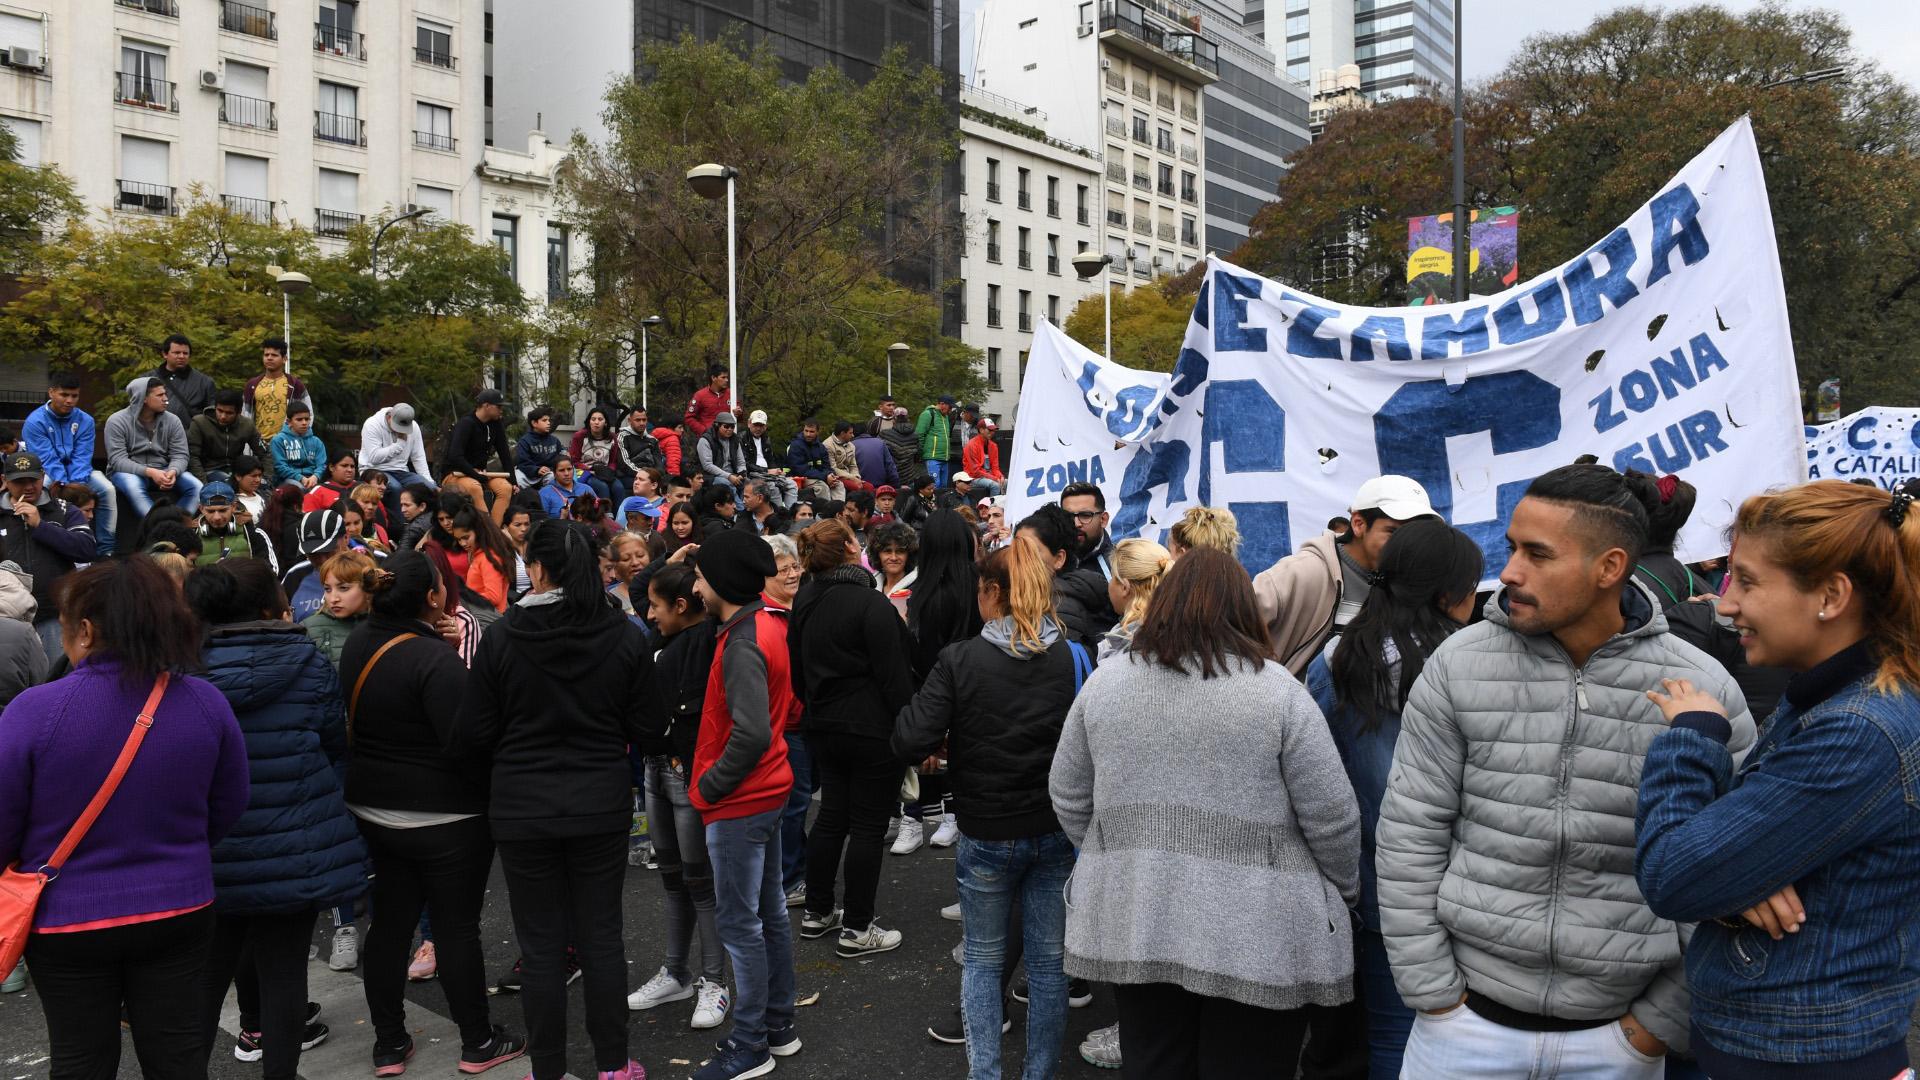 La manifestación duró cerca de seis horas